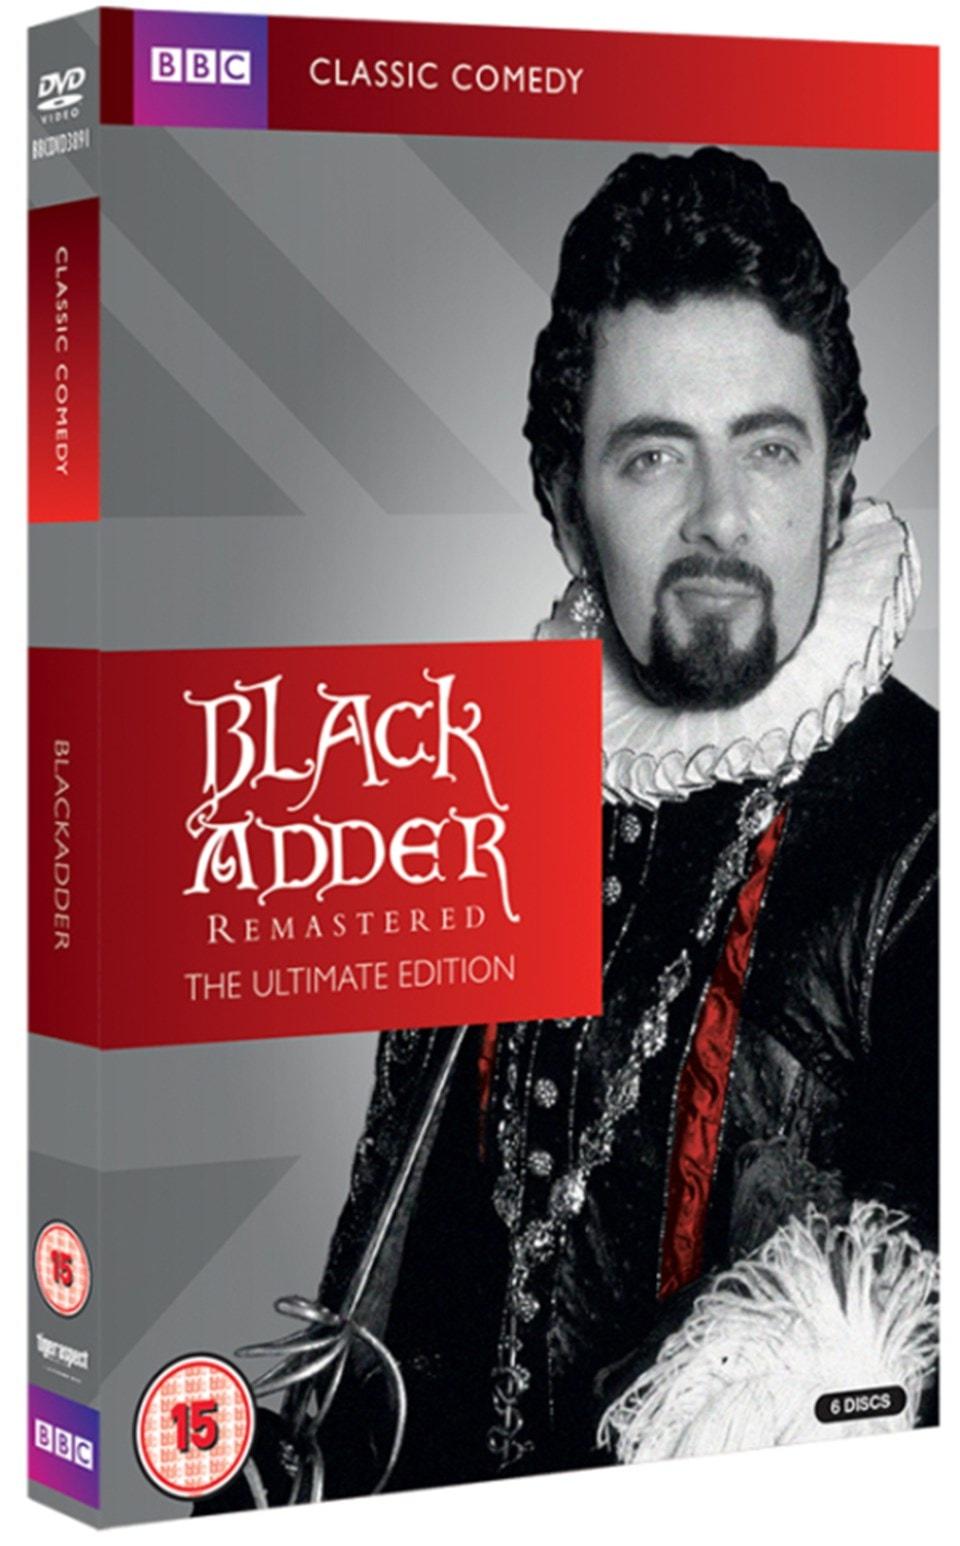 Blackadder: Remastered - The Ultimate Edition (hmv Exclusive) - 2